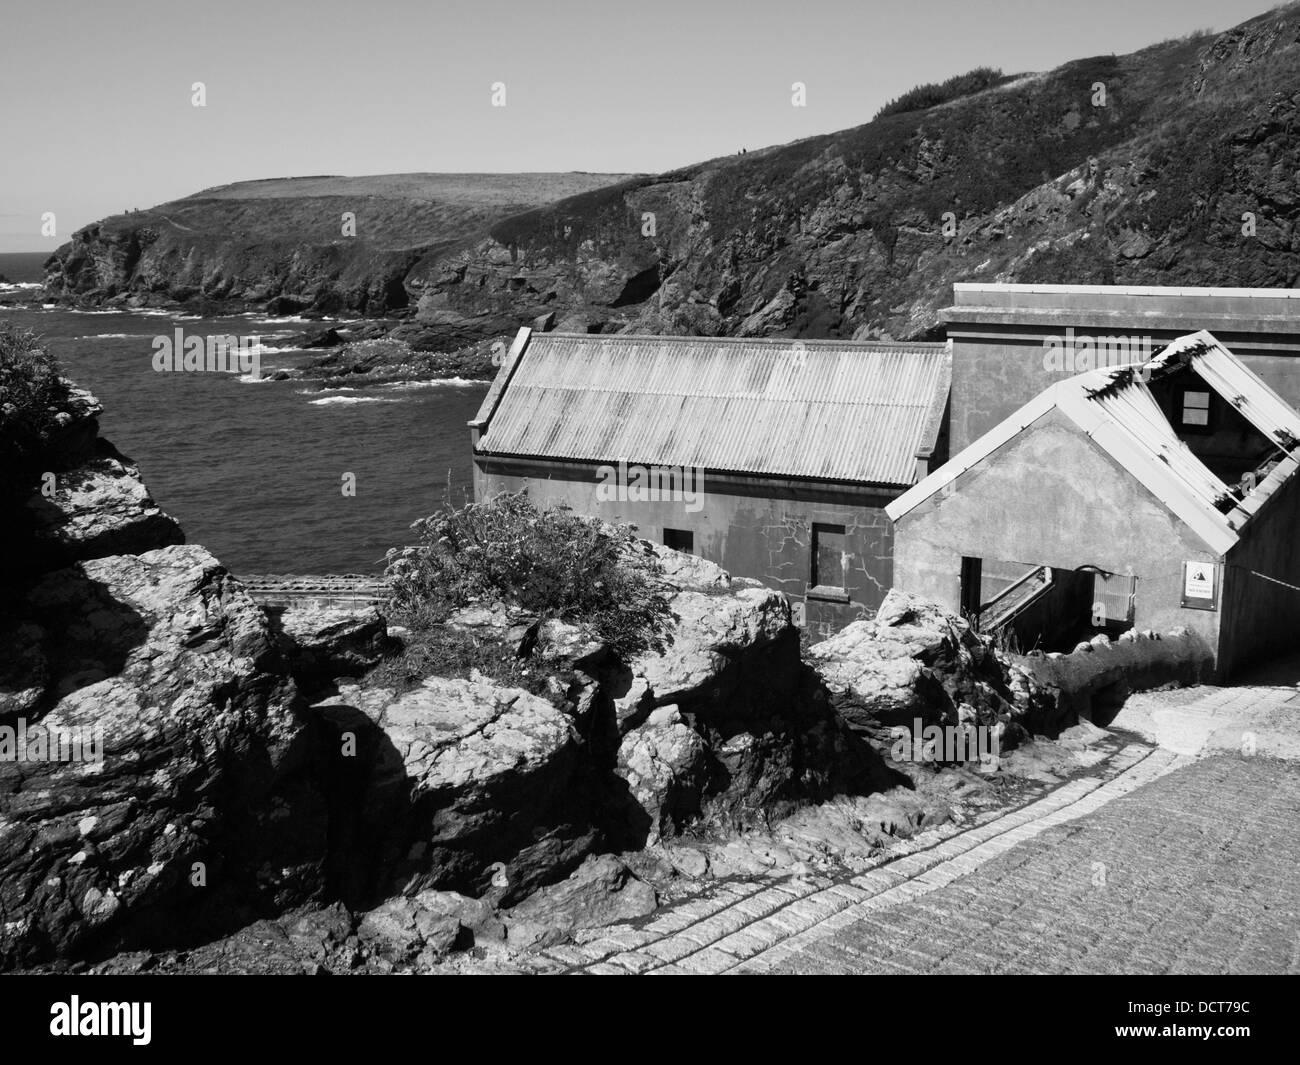 The Old Life Boat House at Lizard Head. the Lizard Peninsula Cornwall England UK - Stock Image